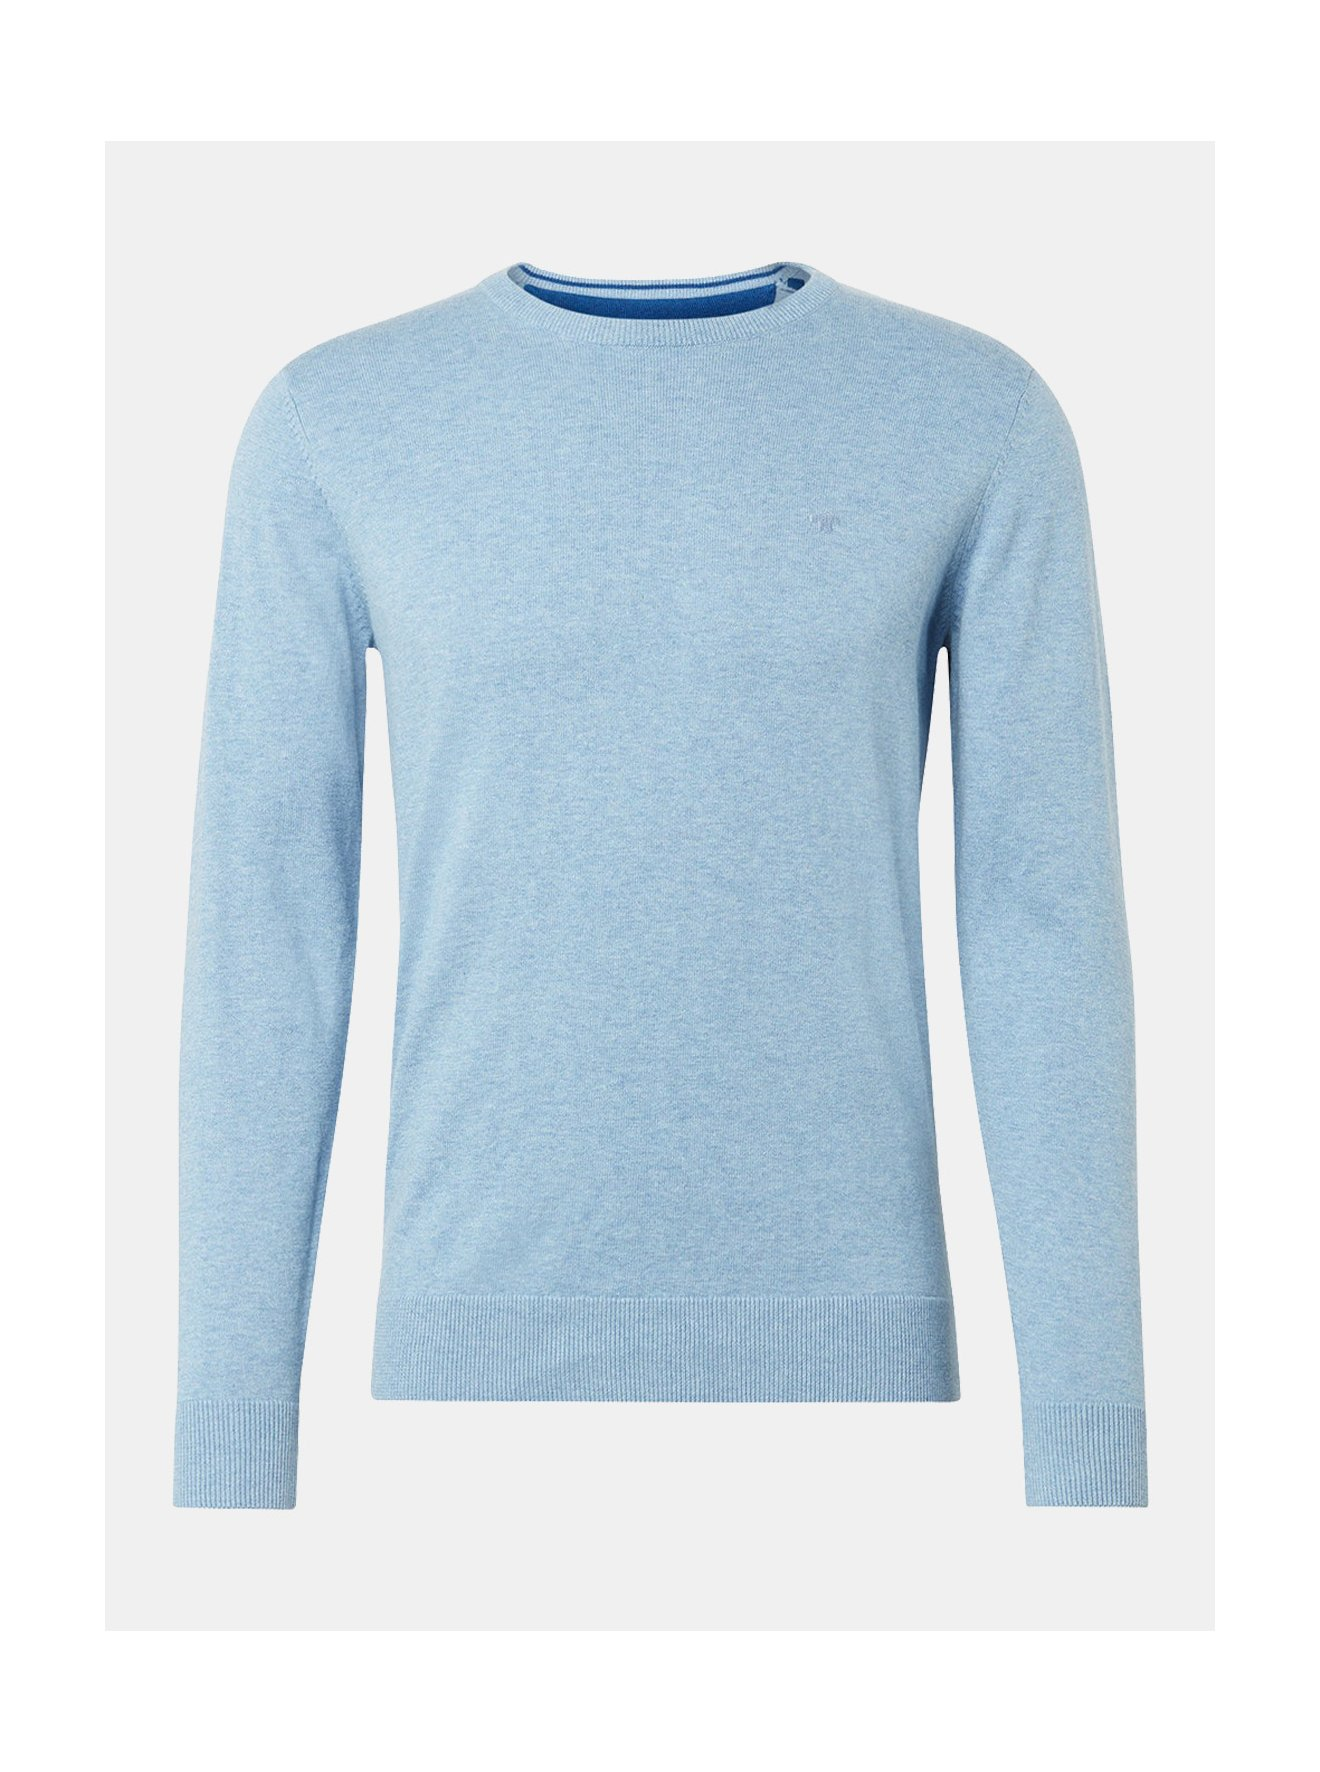 d86a668e9e92 Světle modrý pánský svetr Tom Tailor - SLEVA!